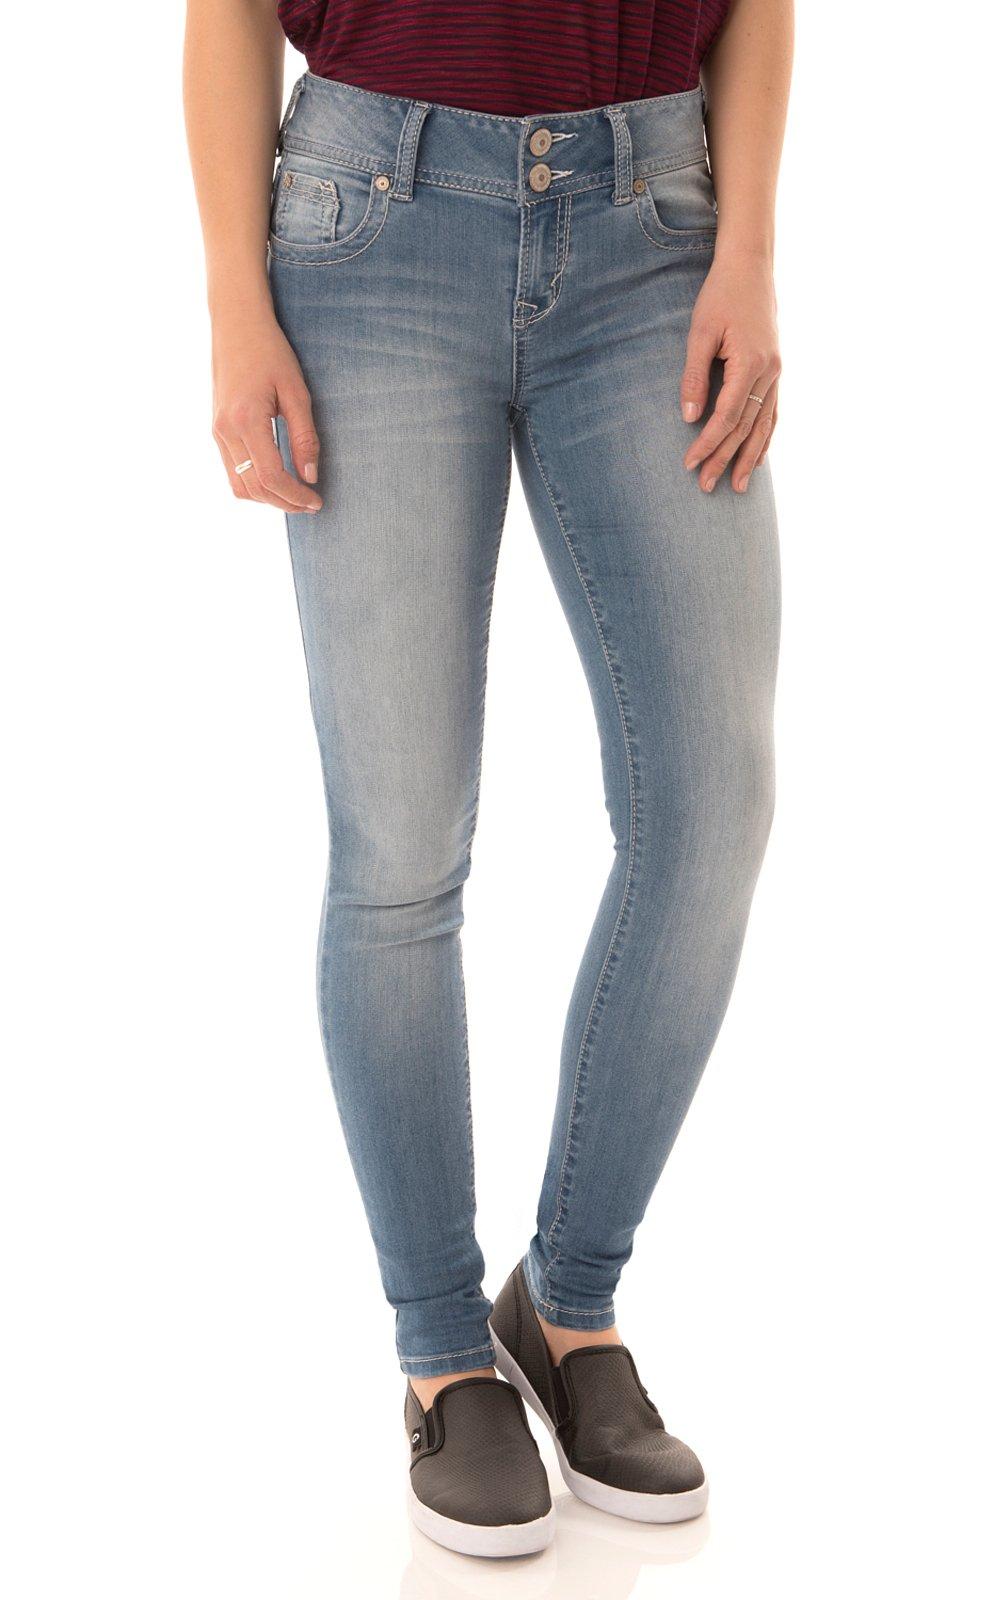 WallFlower Juniors InstaSoft Ultra Fit Skinny Jeans